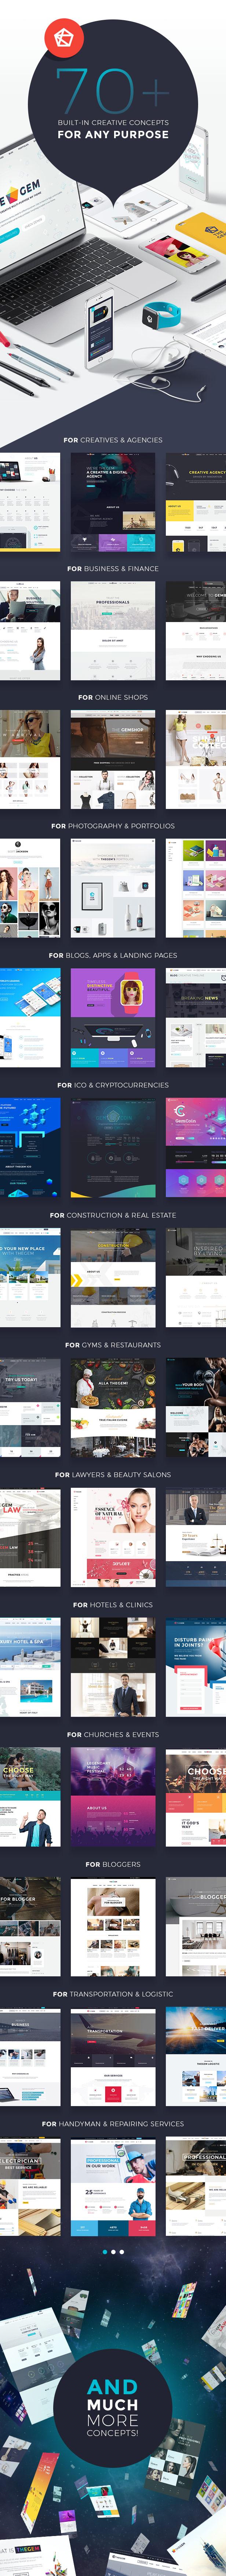 1 new 2 - TheGem - Creative Multi-Purpose High-Performance WordPress Theme